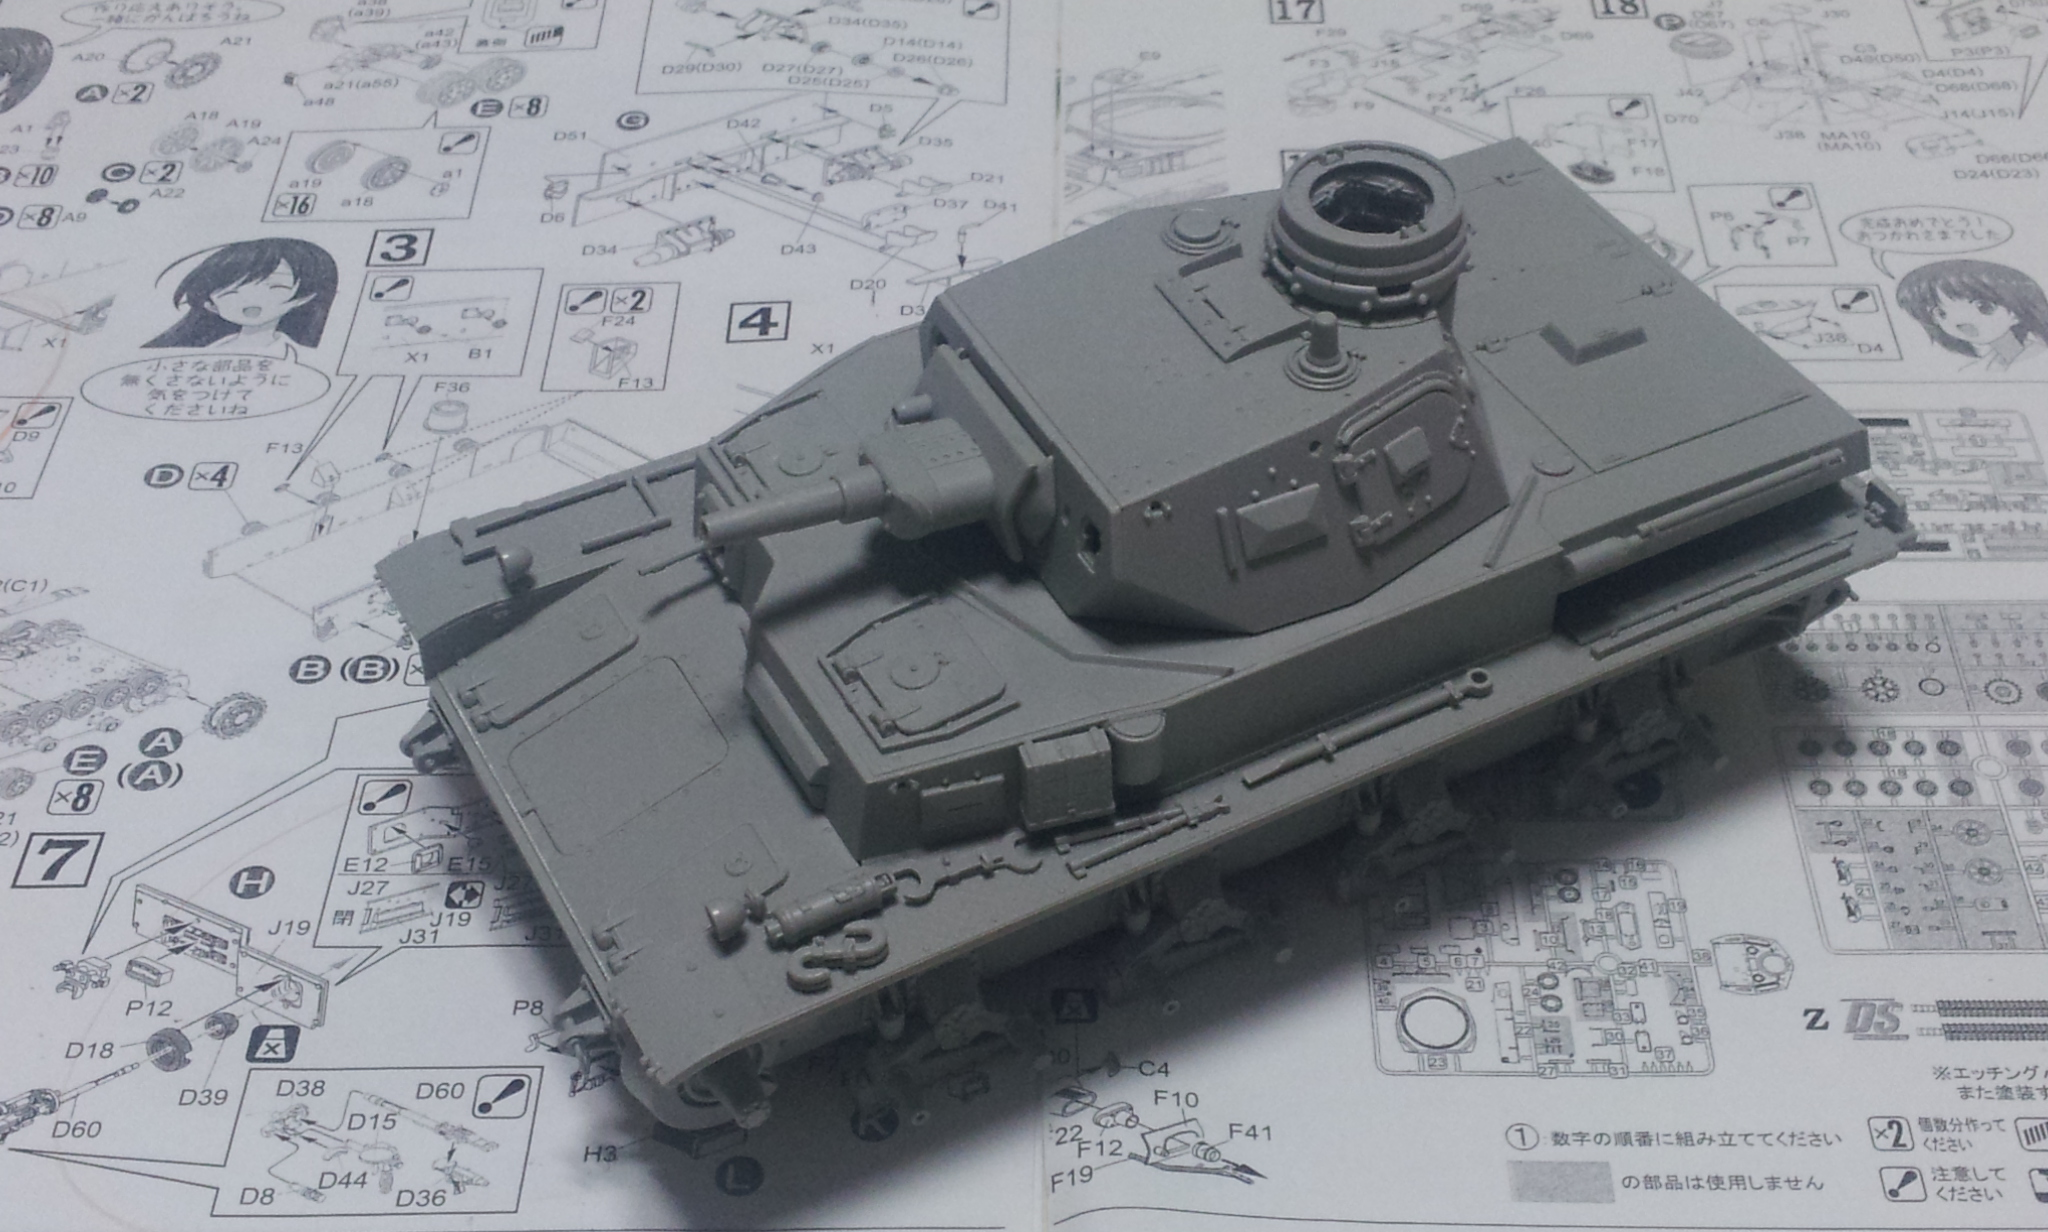 [Girls & Panzer / 4호전차 D형] 조립 마무리중.